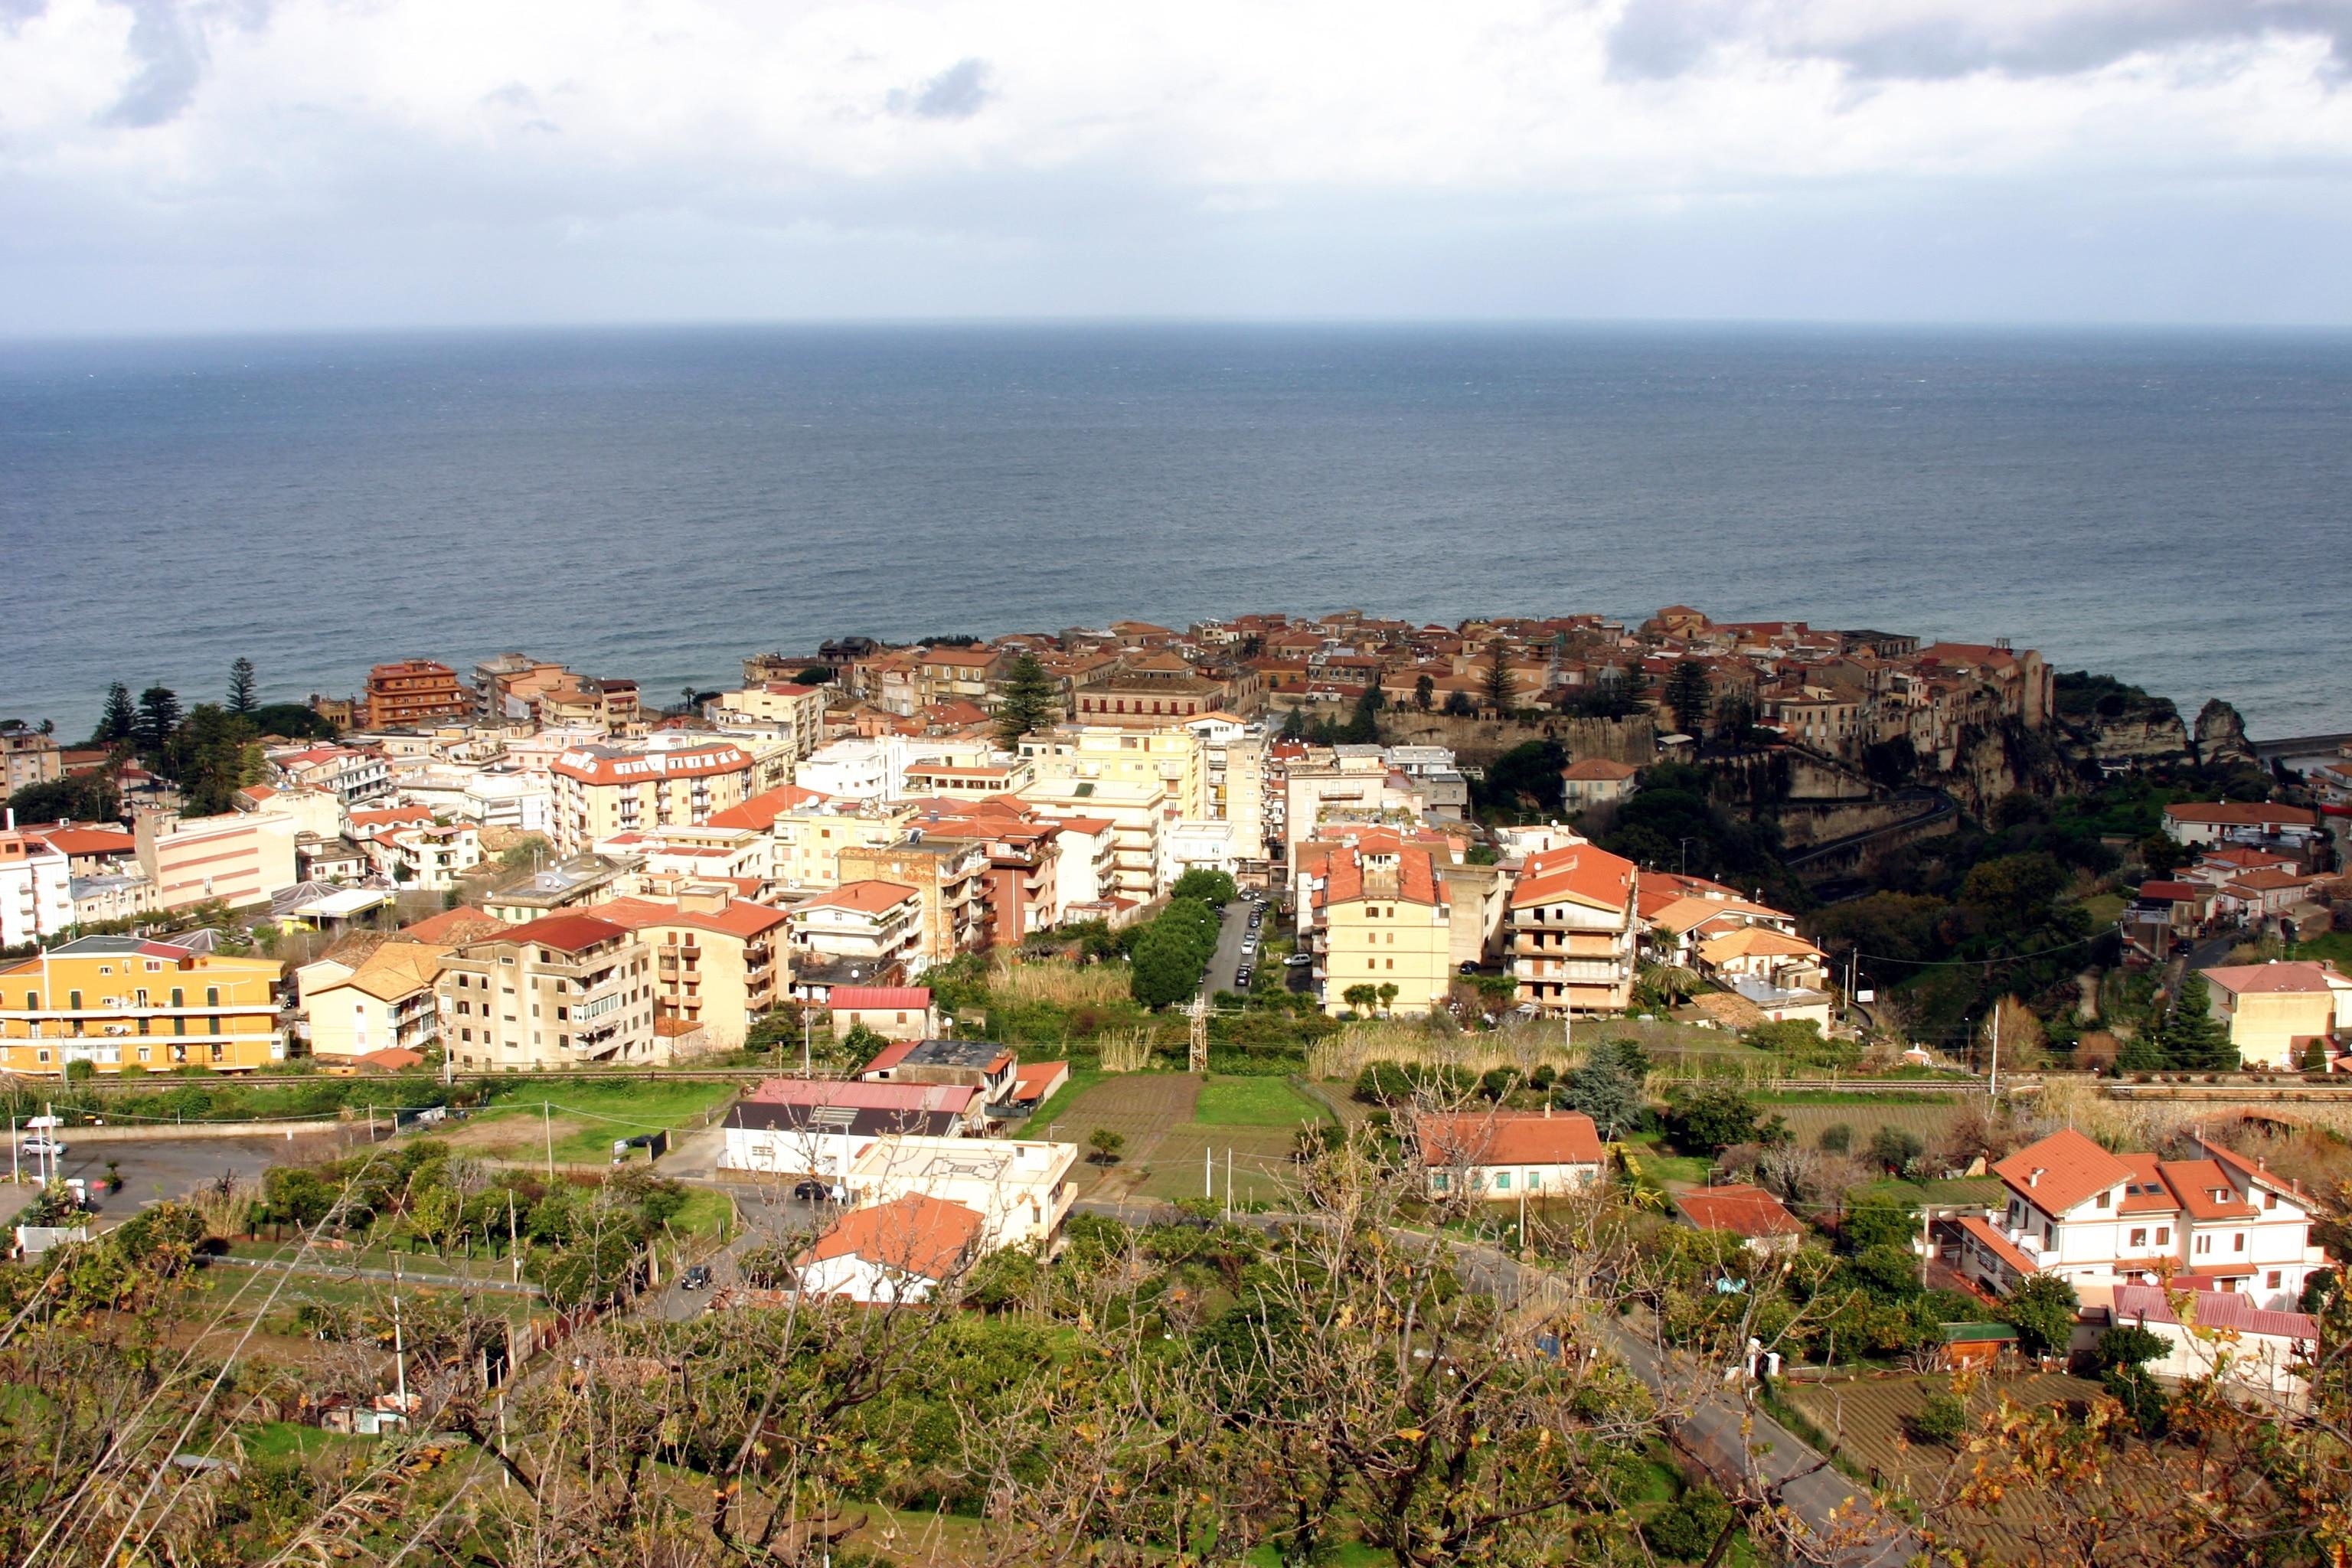 Drapia, Calabria, Italy